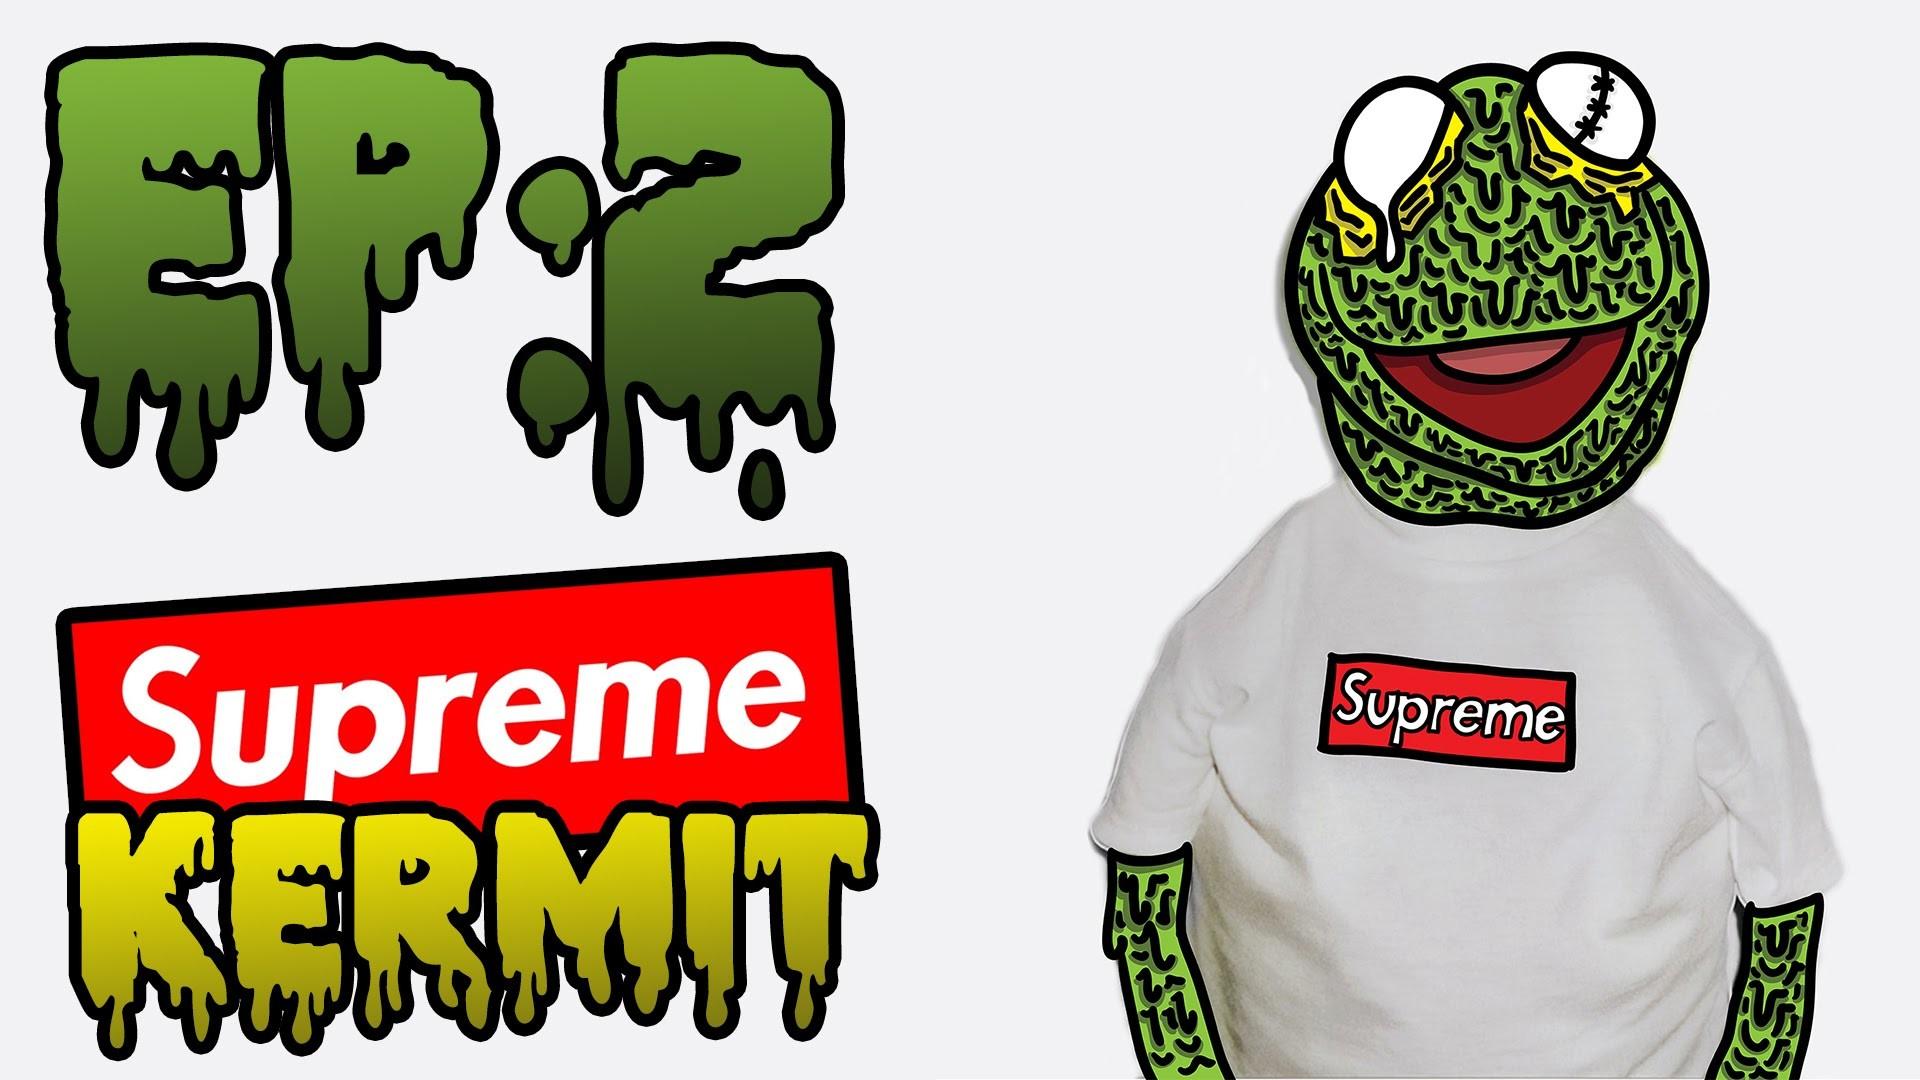 Download Supreme Kermit Wallpaper Gallery